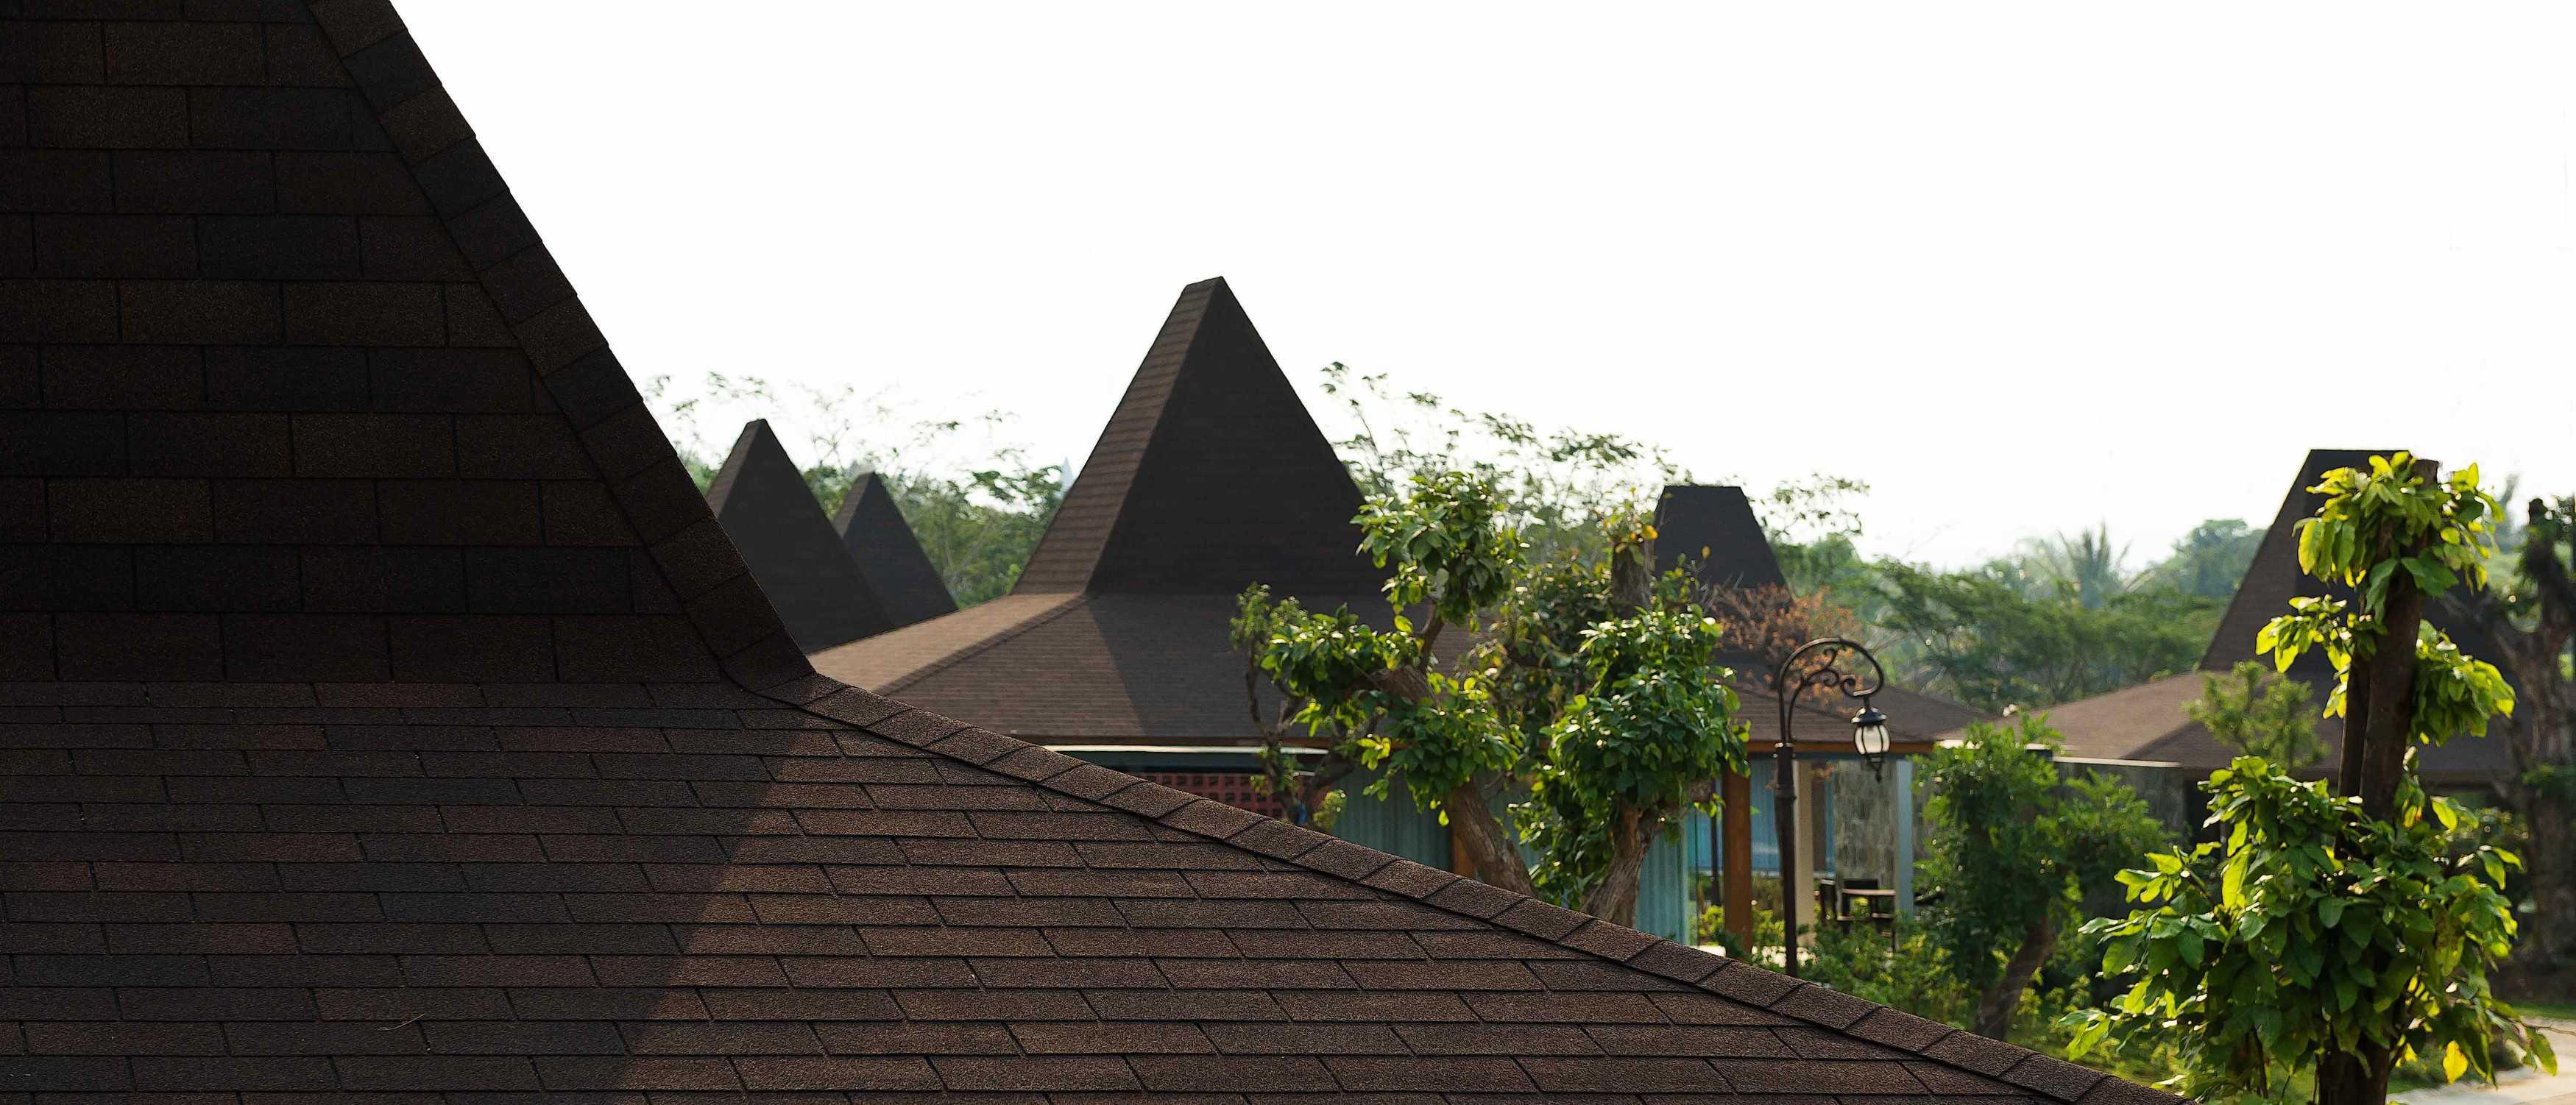 Mint-Ds Djati Lounge & Djoglo Bungalow Araya, Malang, East Java Araya, Malang, East Java Djoglo Bungalow - Roof   16189